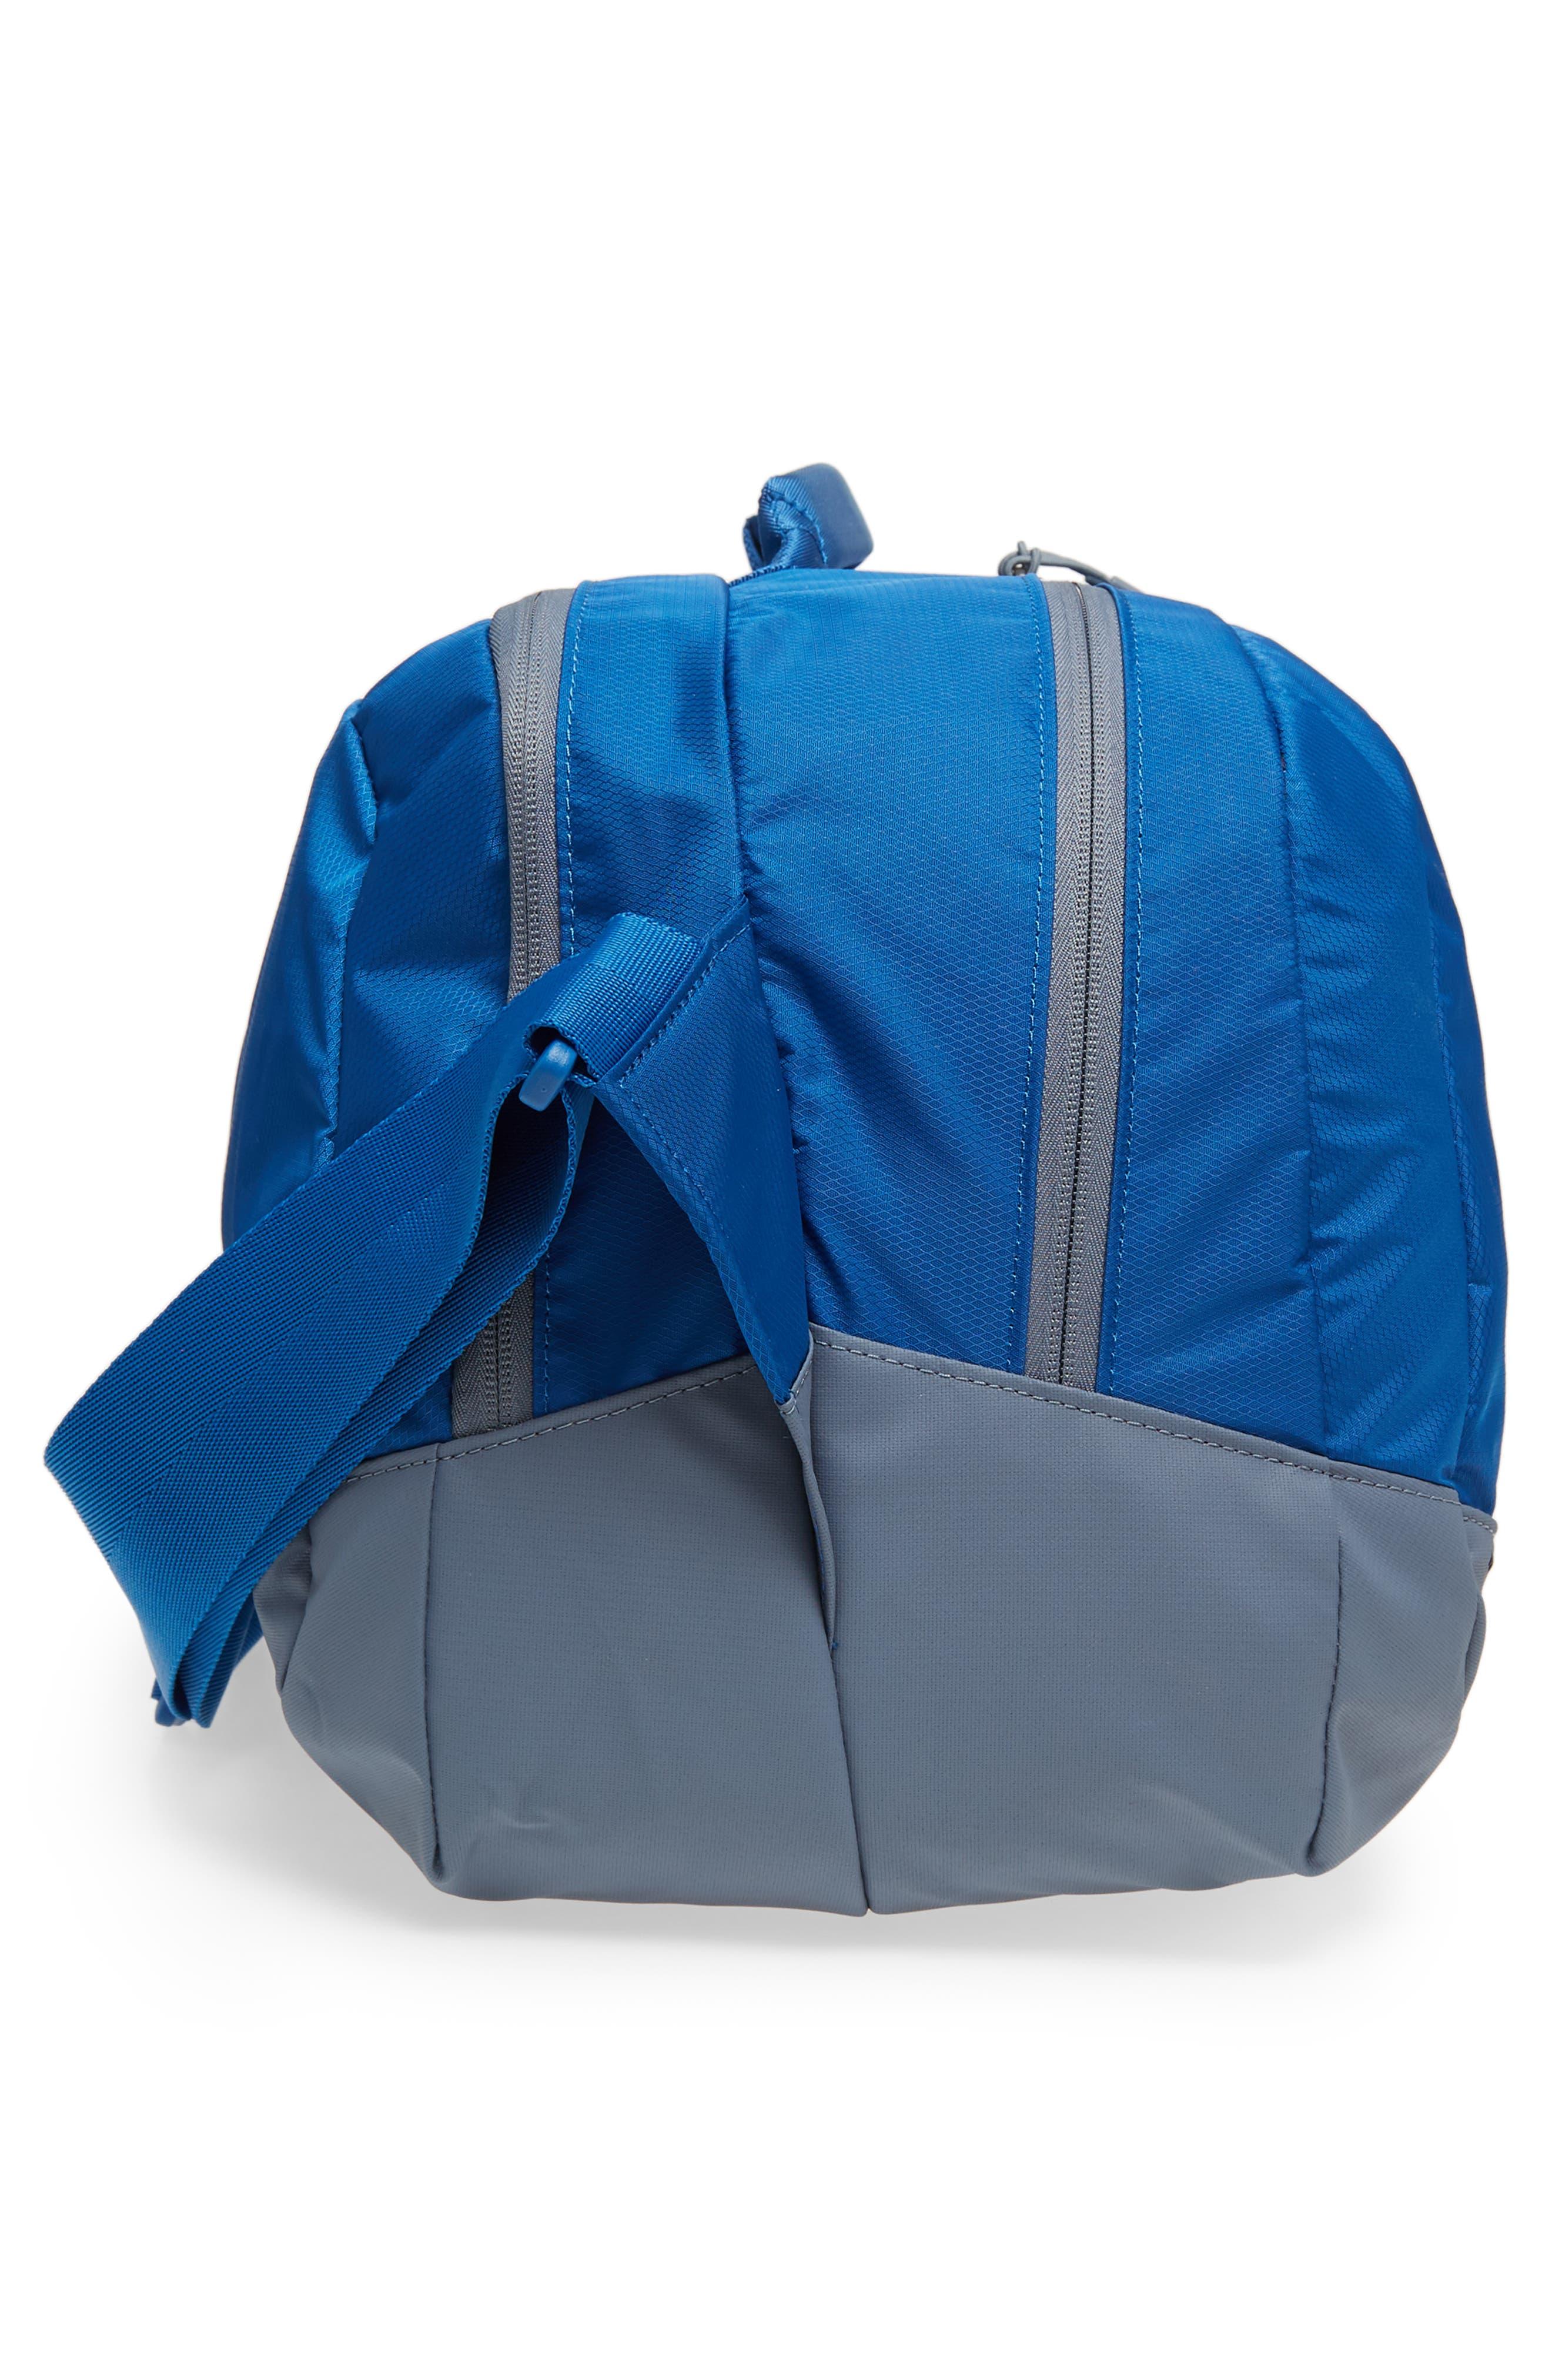 Run Duffel Bag,                             Alternate thumbnail 5, color,                             Blue Jay/ Armory Blue/ Silver